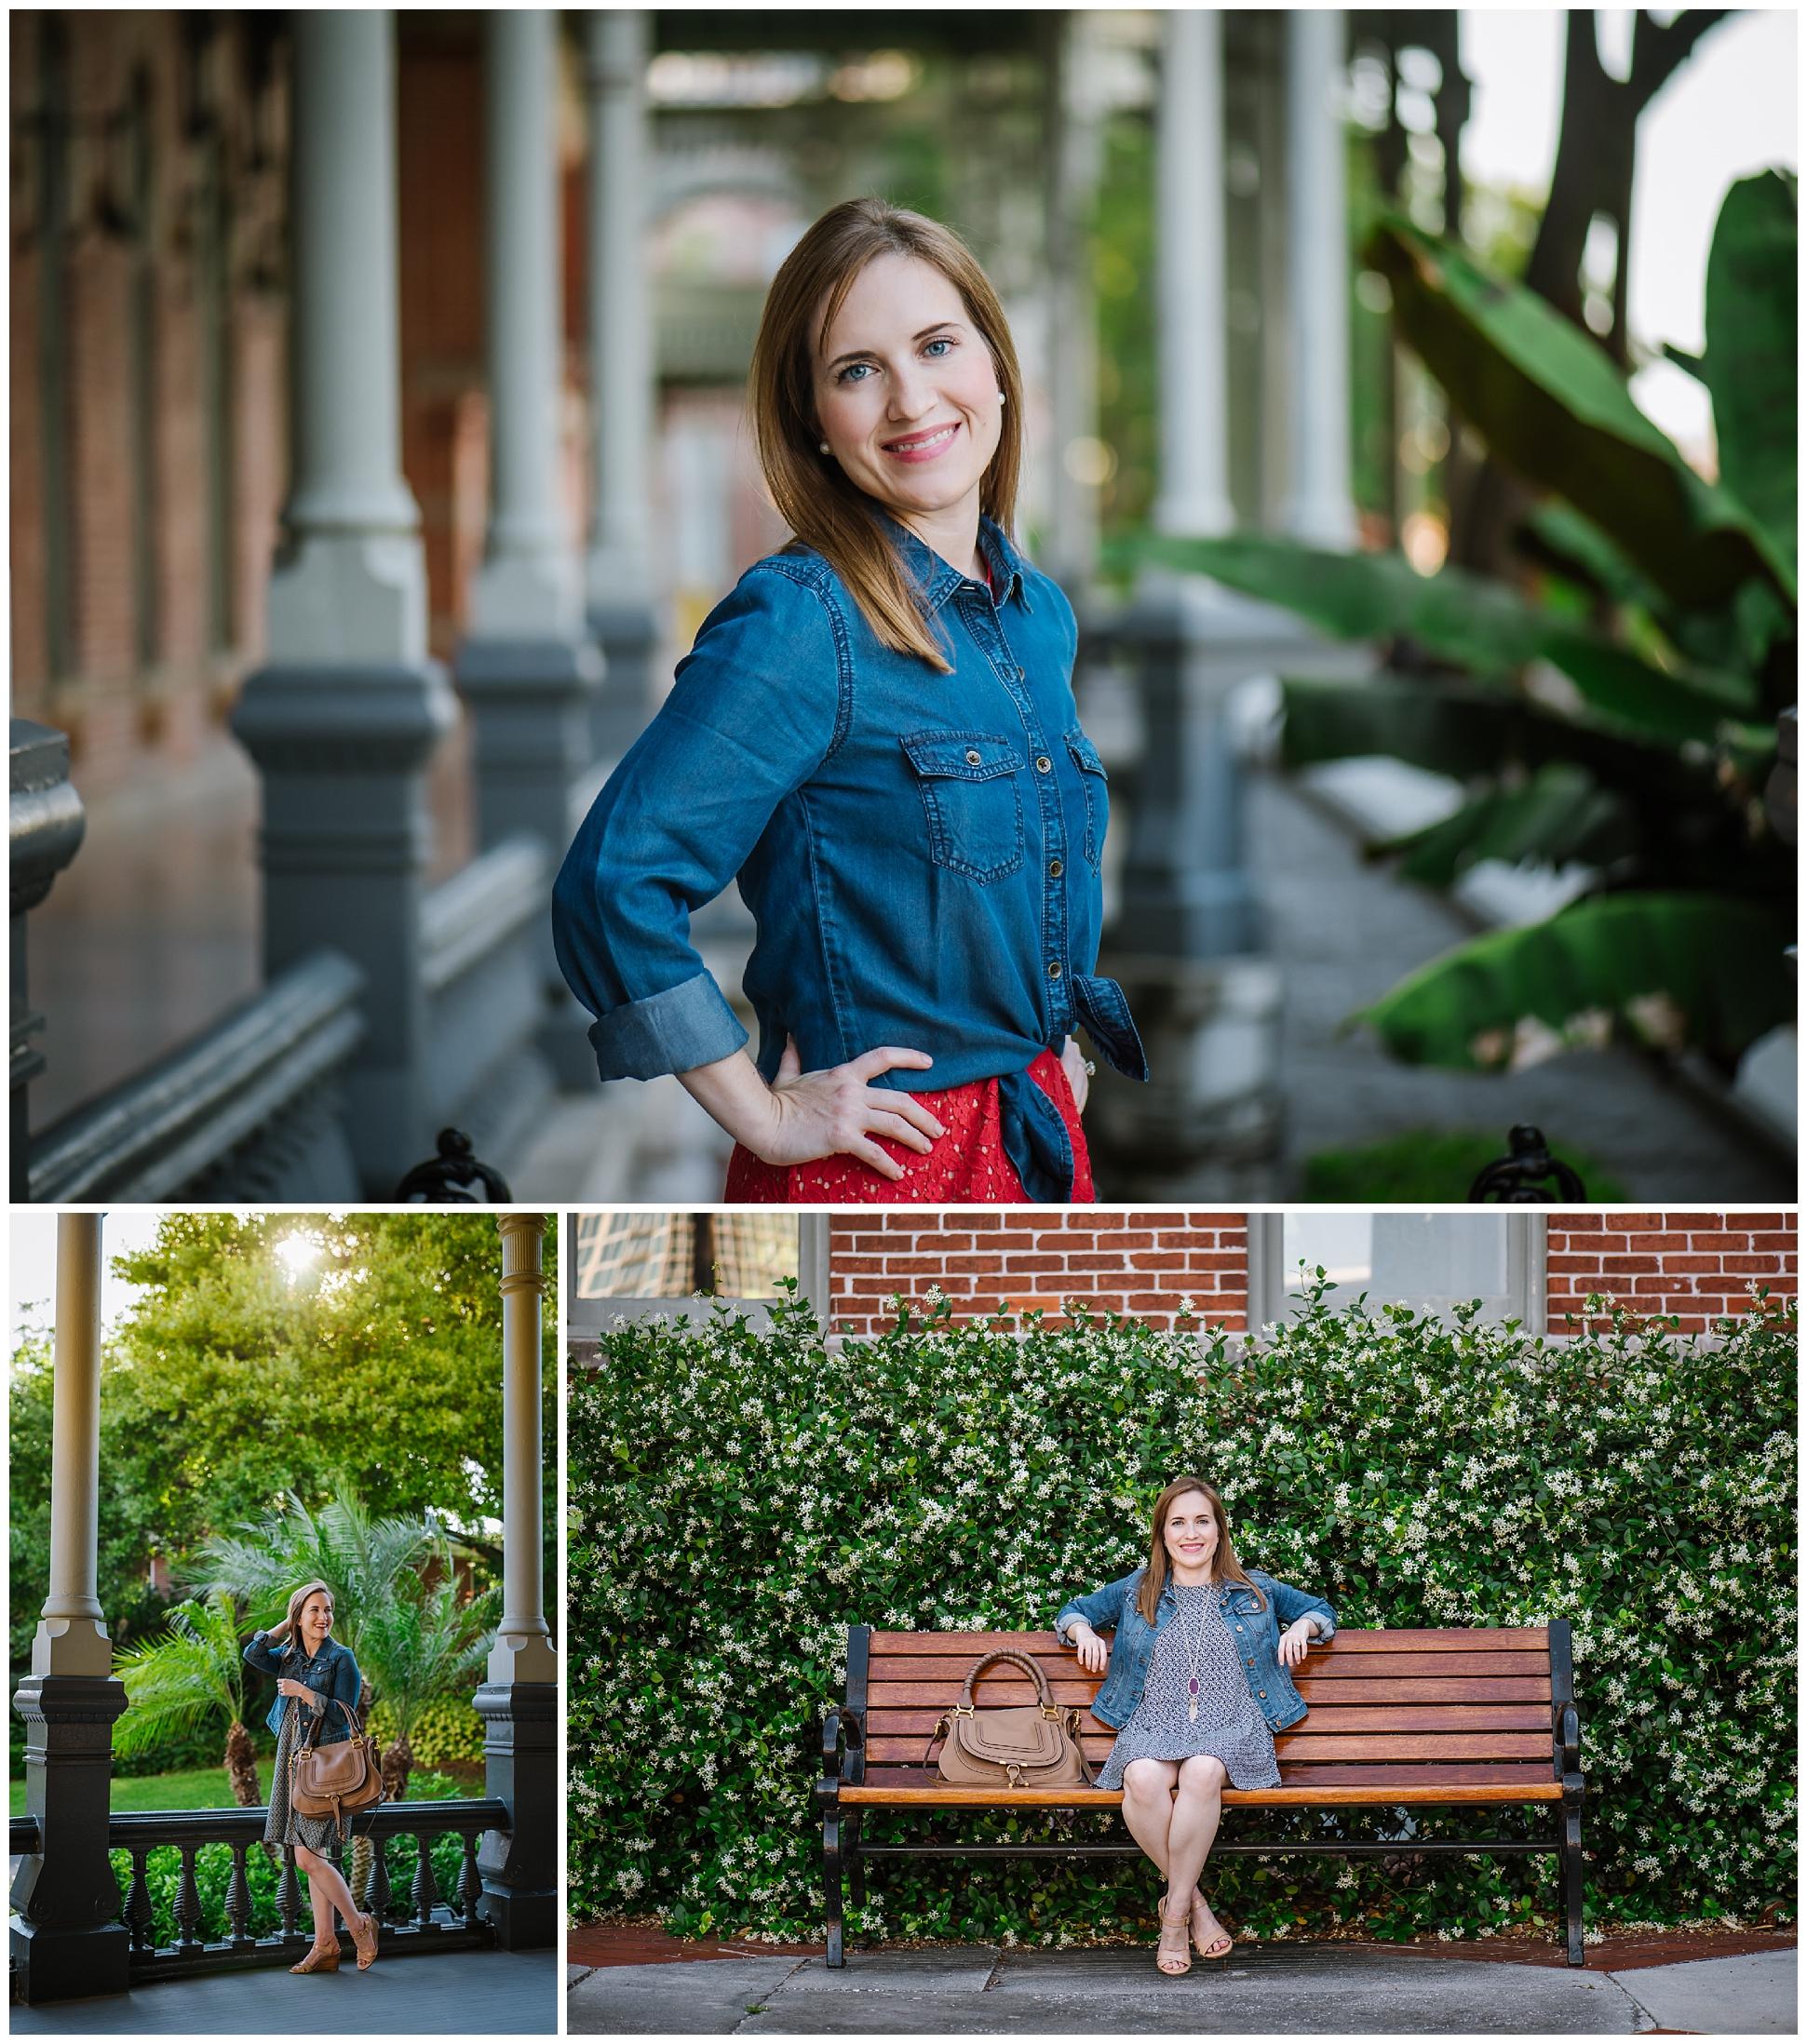 Tampa-lifestyle-bradning-fashion-blogger-photographer_0031.jpg